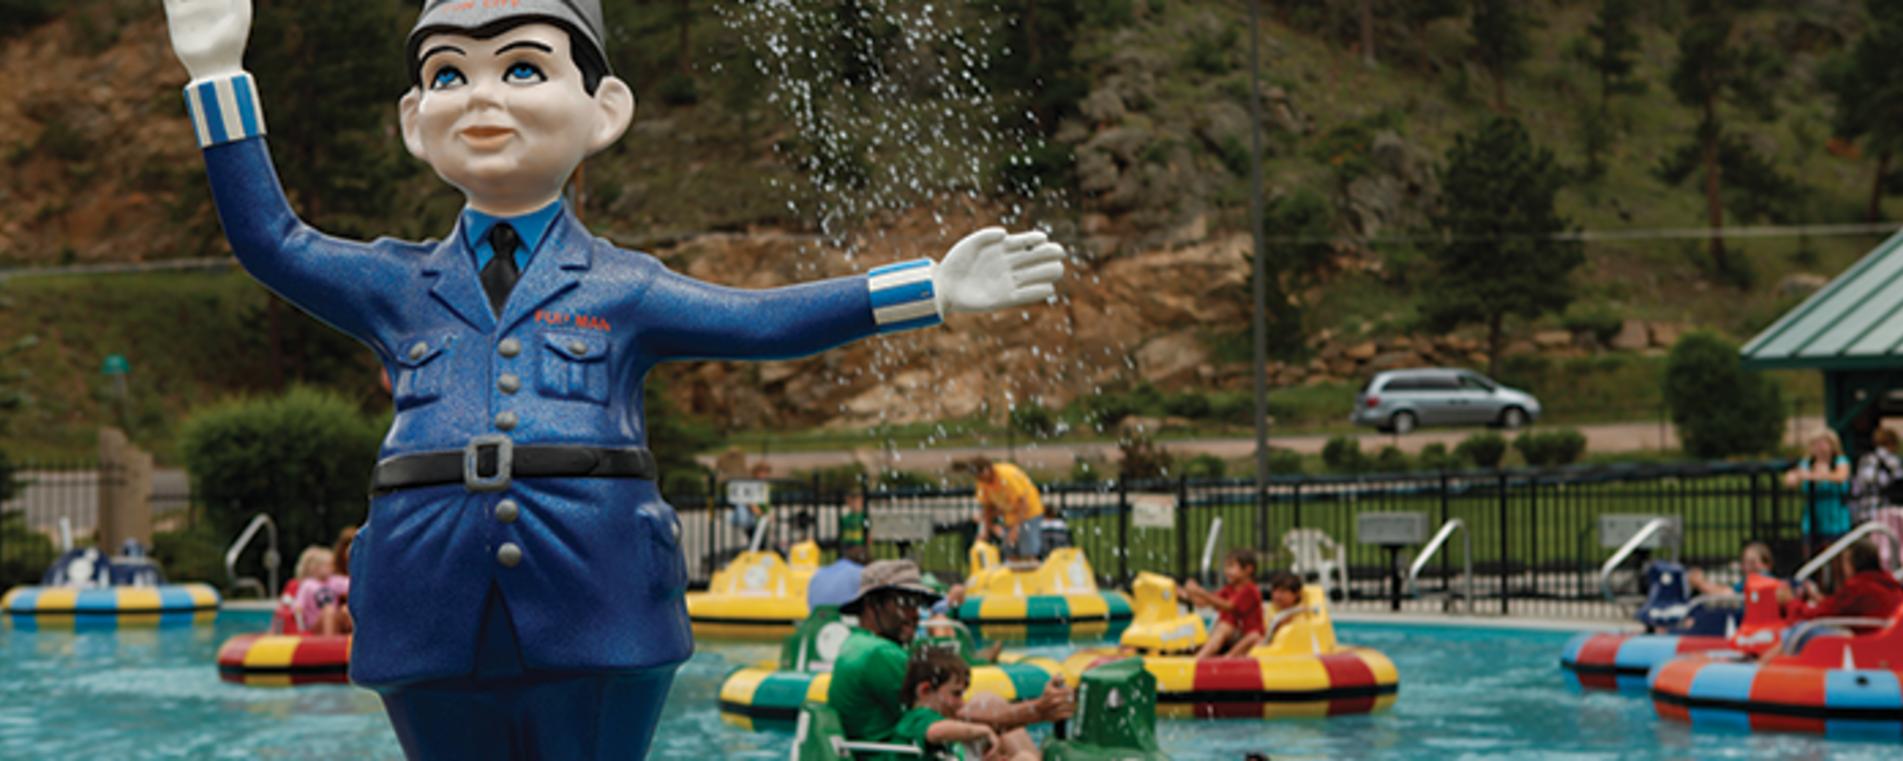 Amusement Parks Header